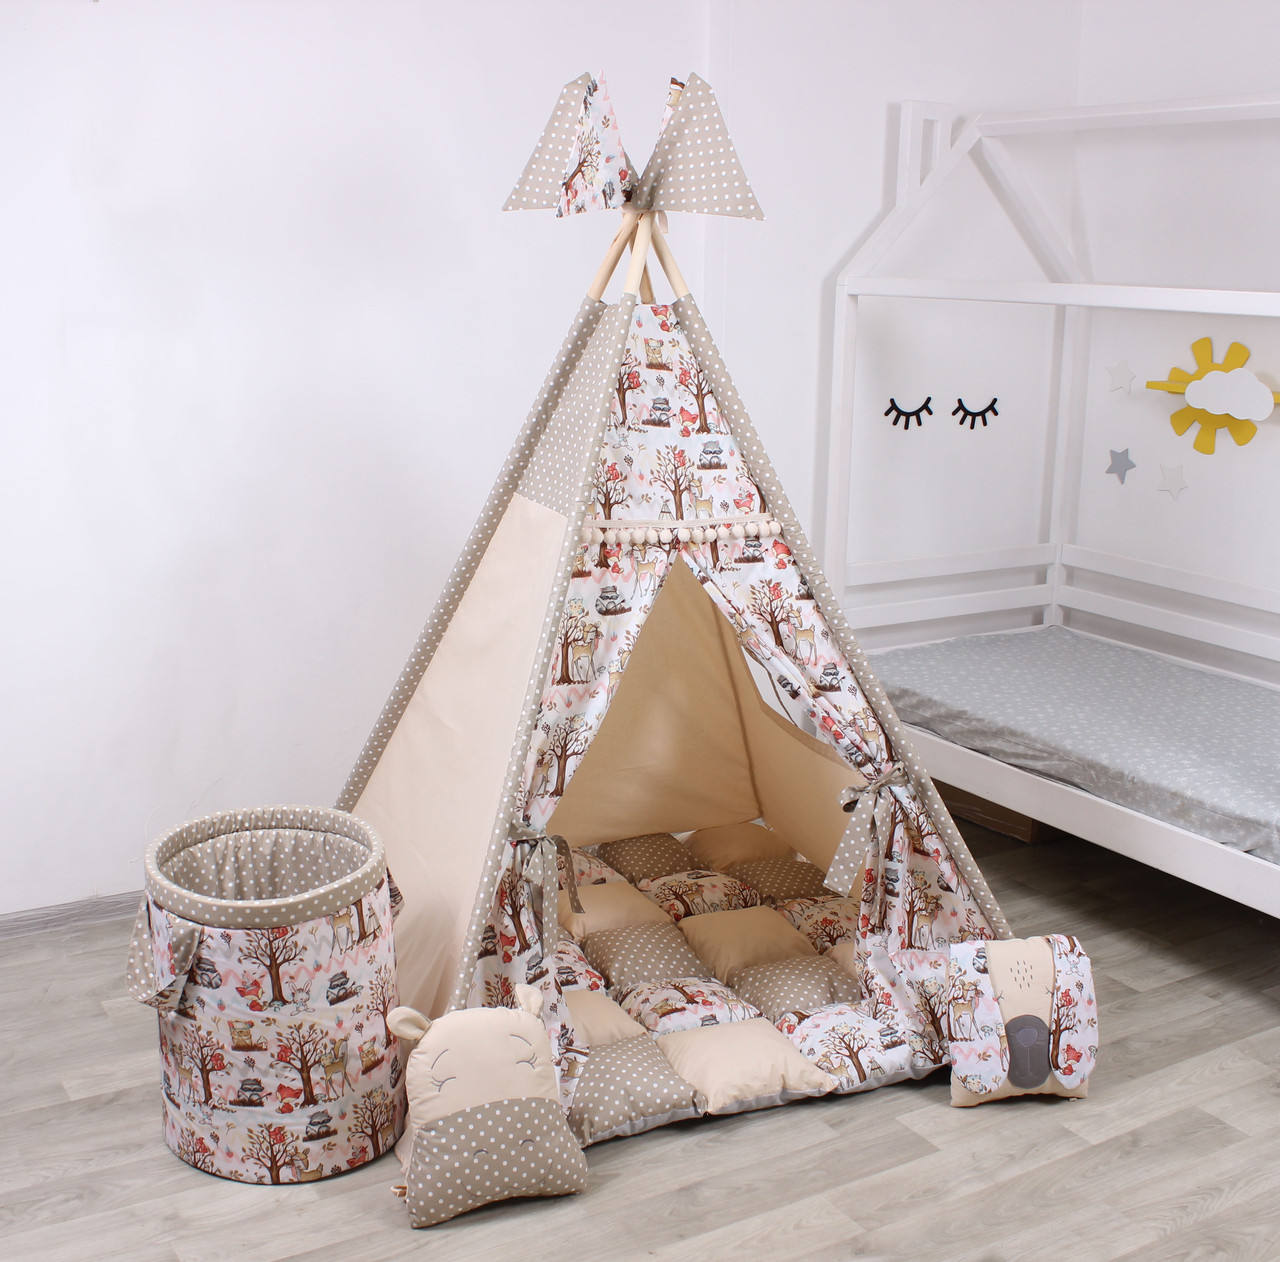 Детская палатка-вигвам с ковриком Индейци в лесу  125х125х170 см